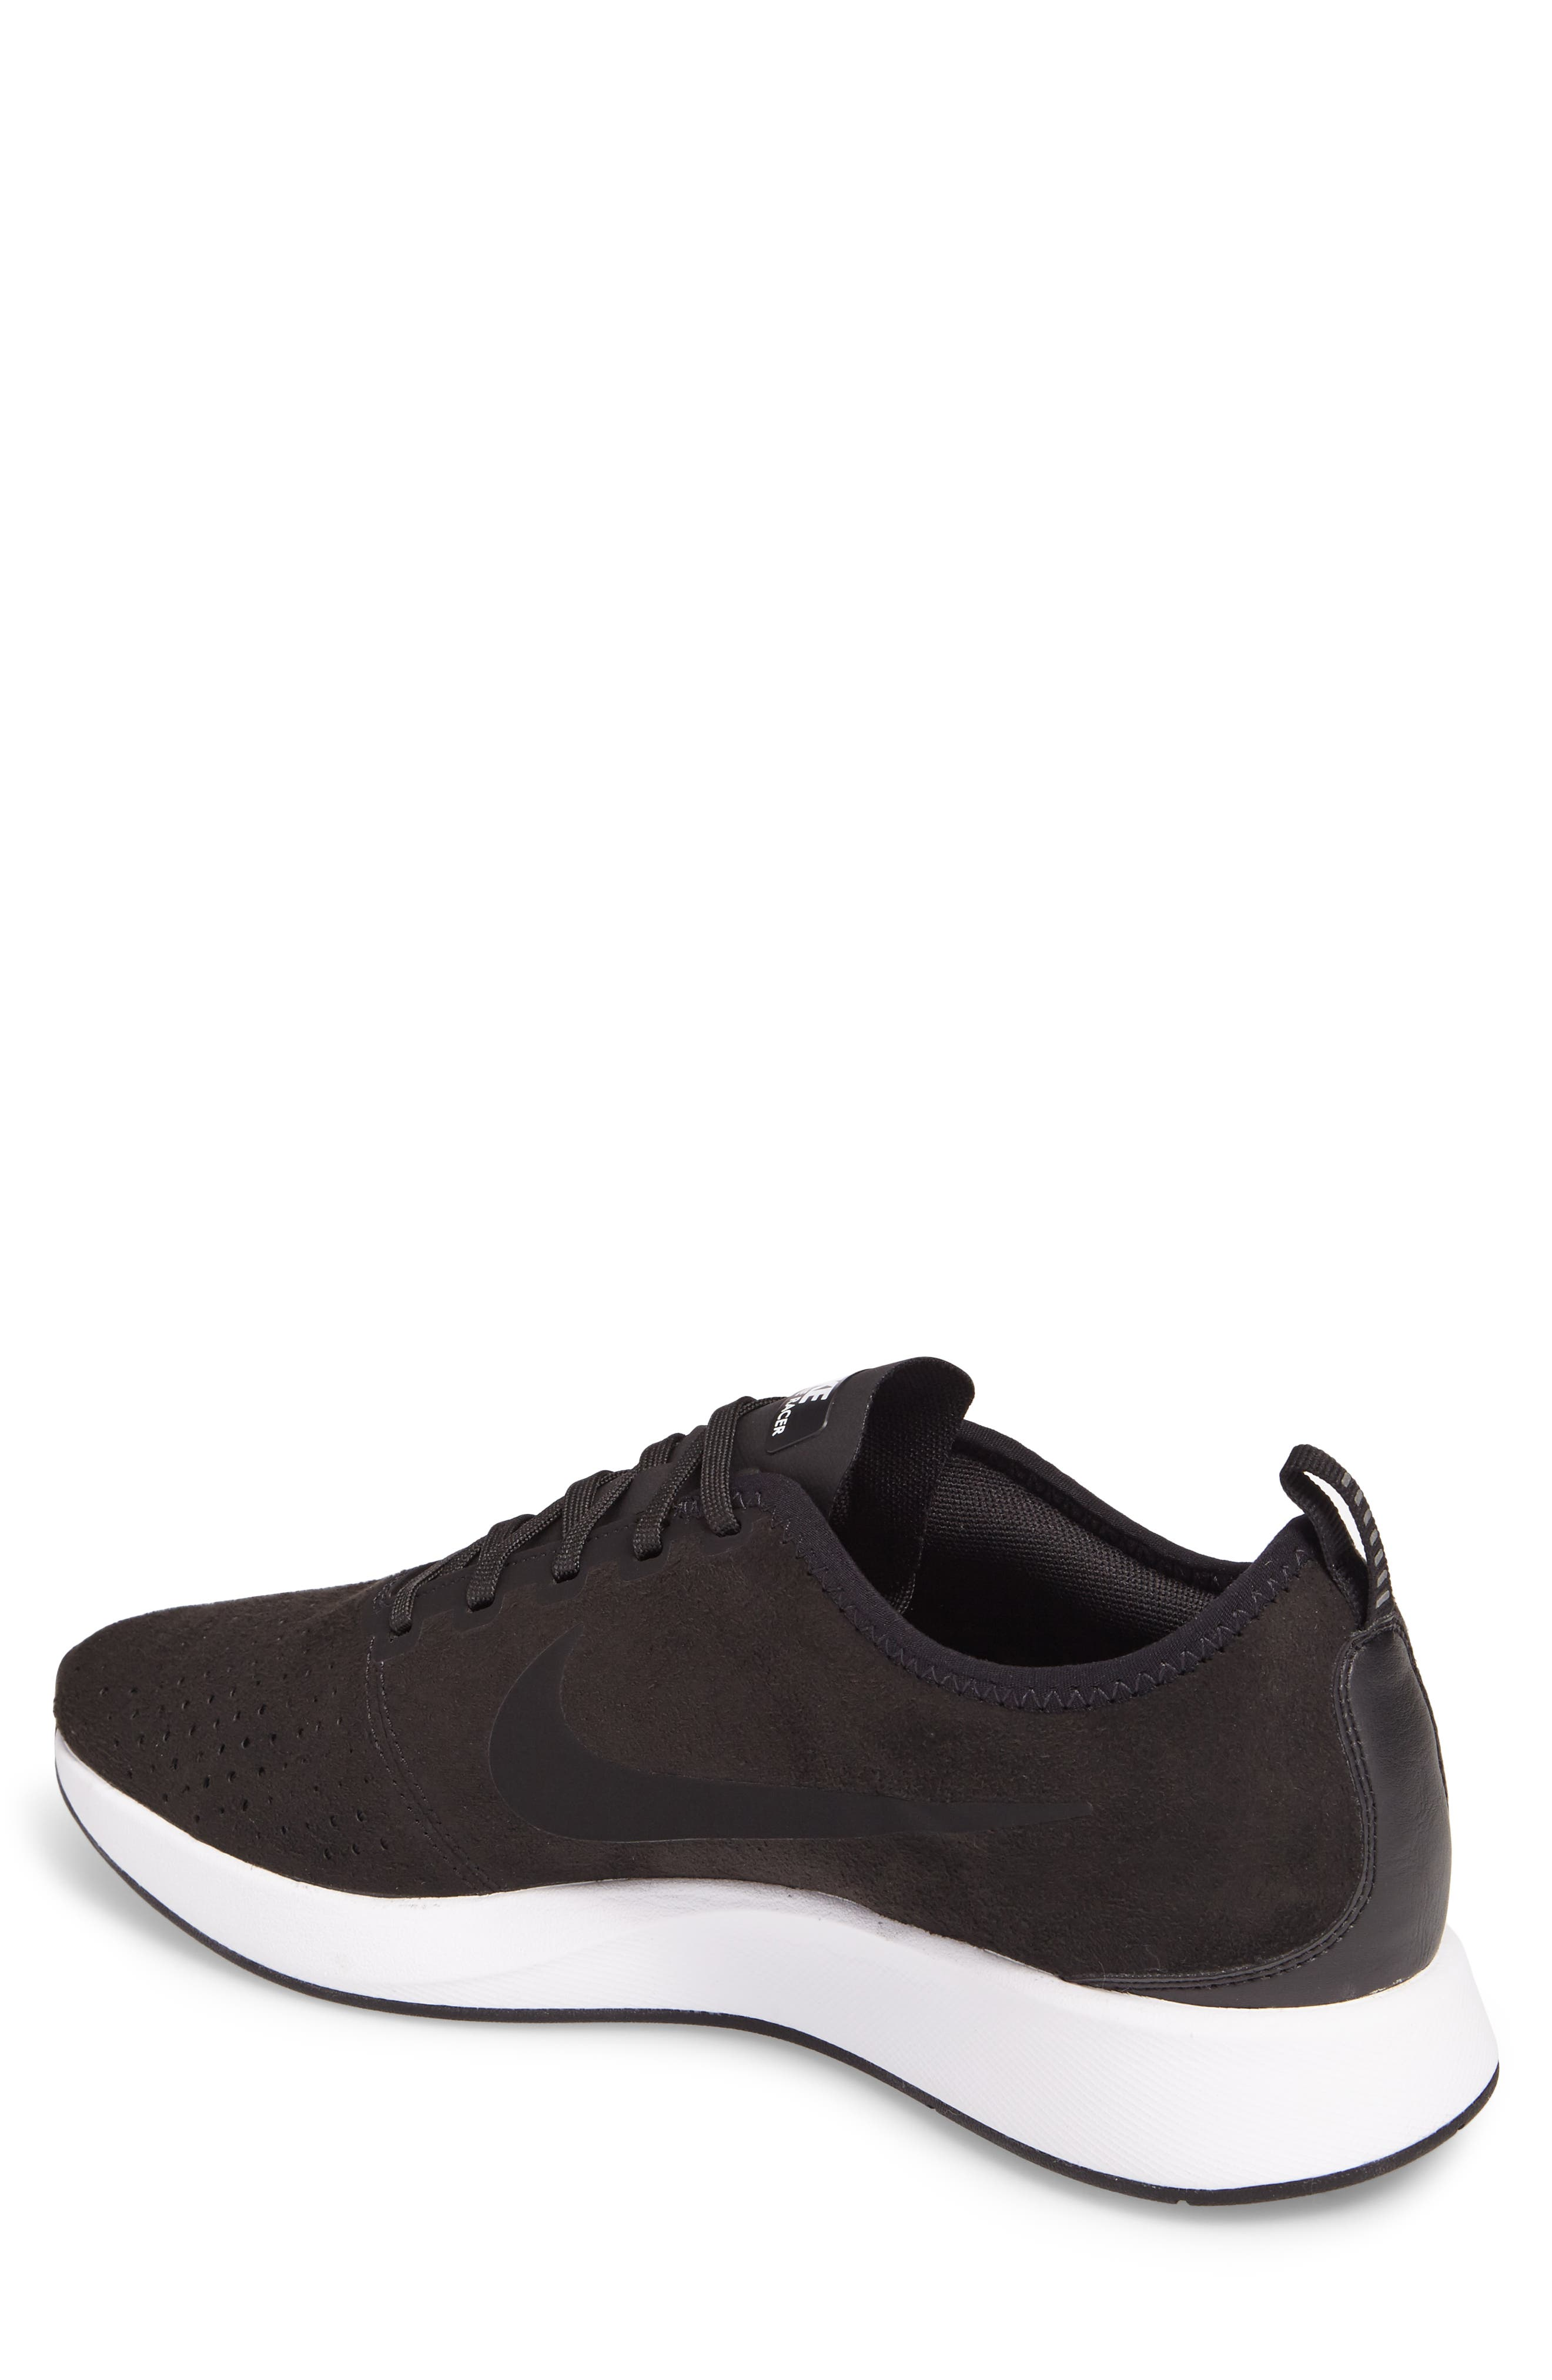 Dualtone Racer Premium Sneaker,                             Alternate thumbnail 2, color,                             Black/Black/White